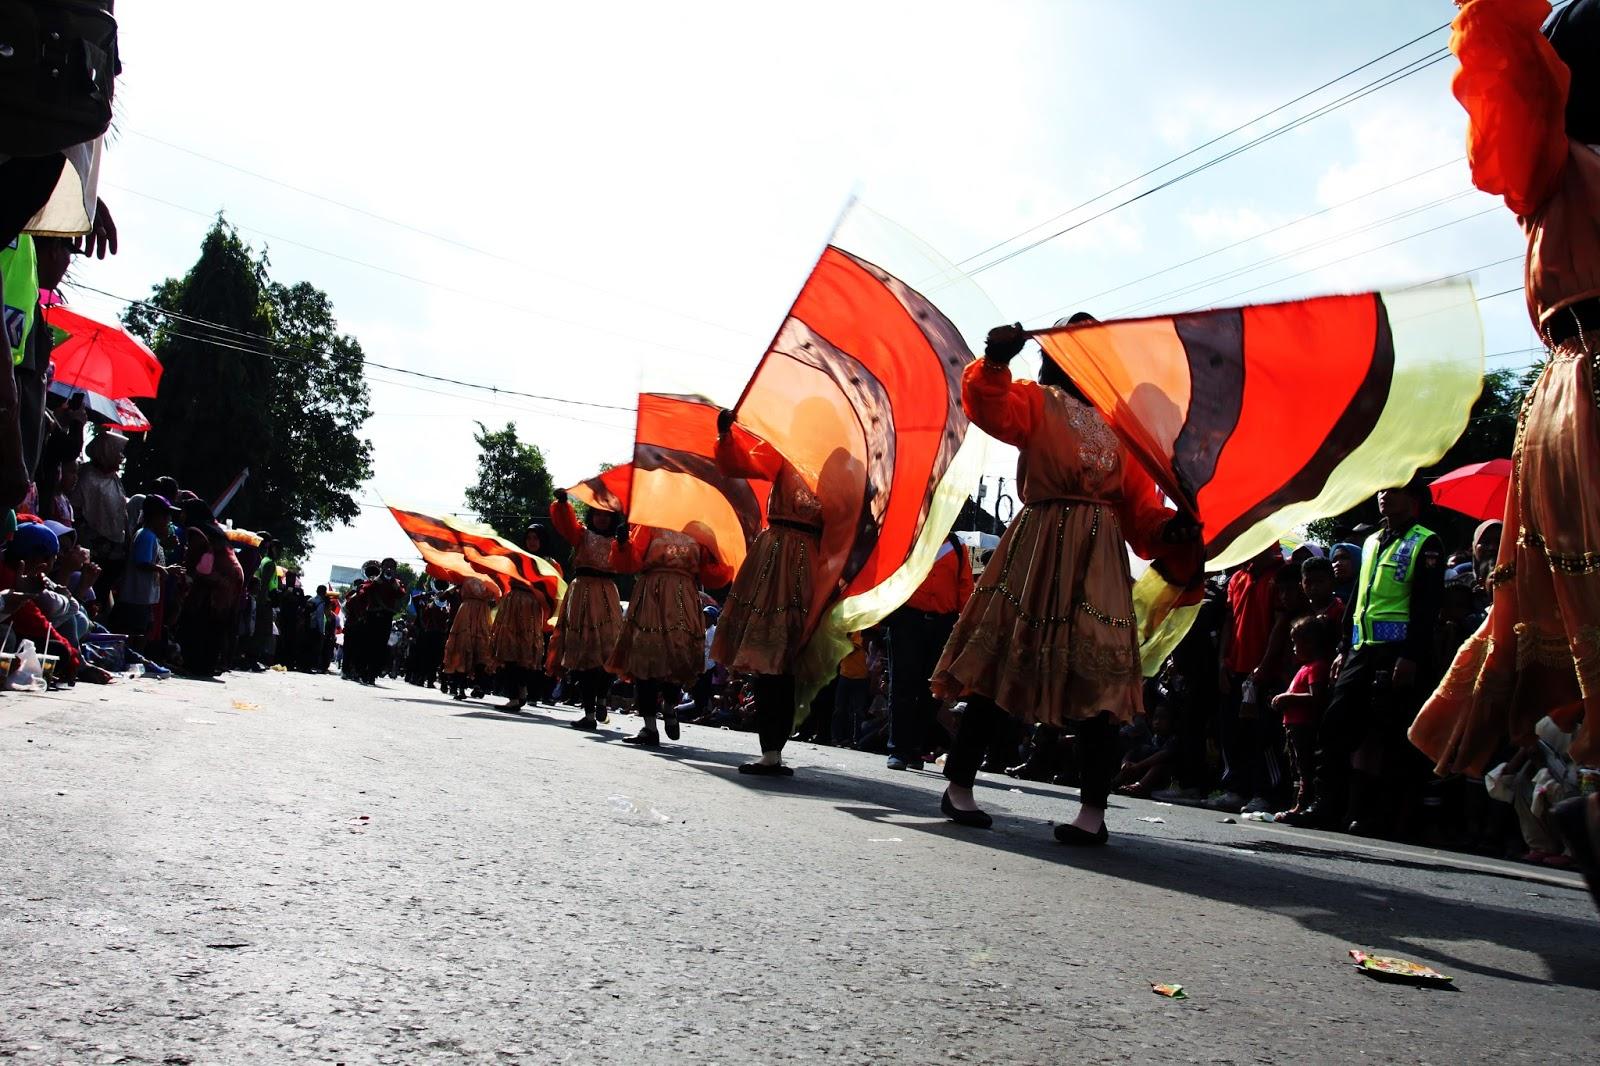 Karnaval Kabupaten Karanganyar 2017 Hut Ri 72 Intanpari Star Alun